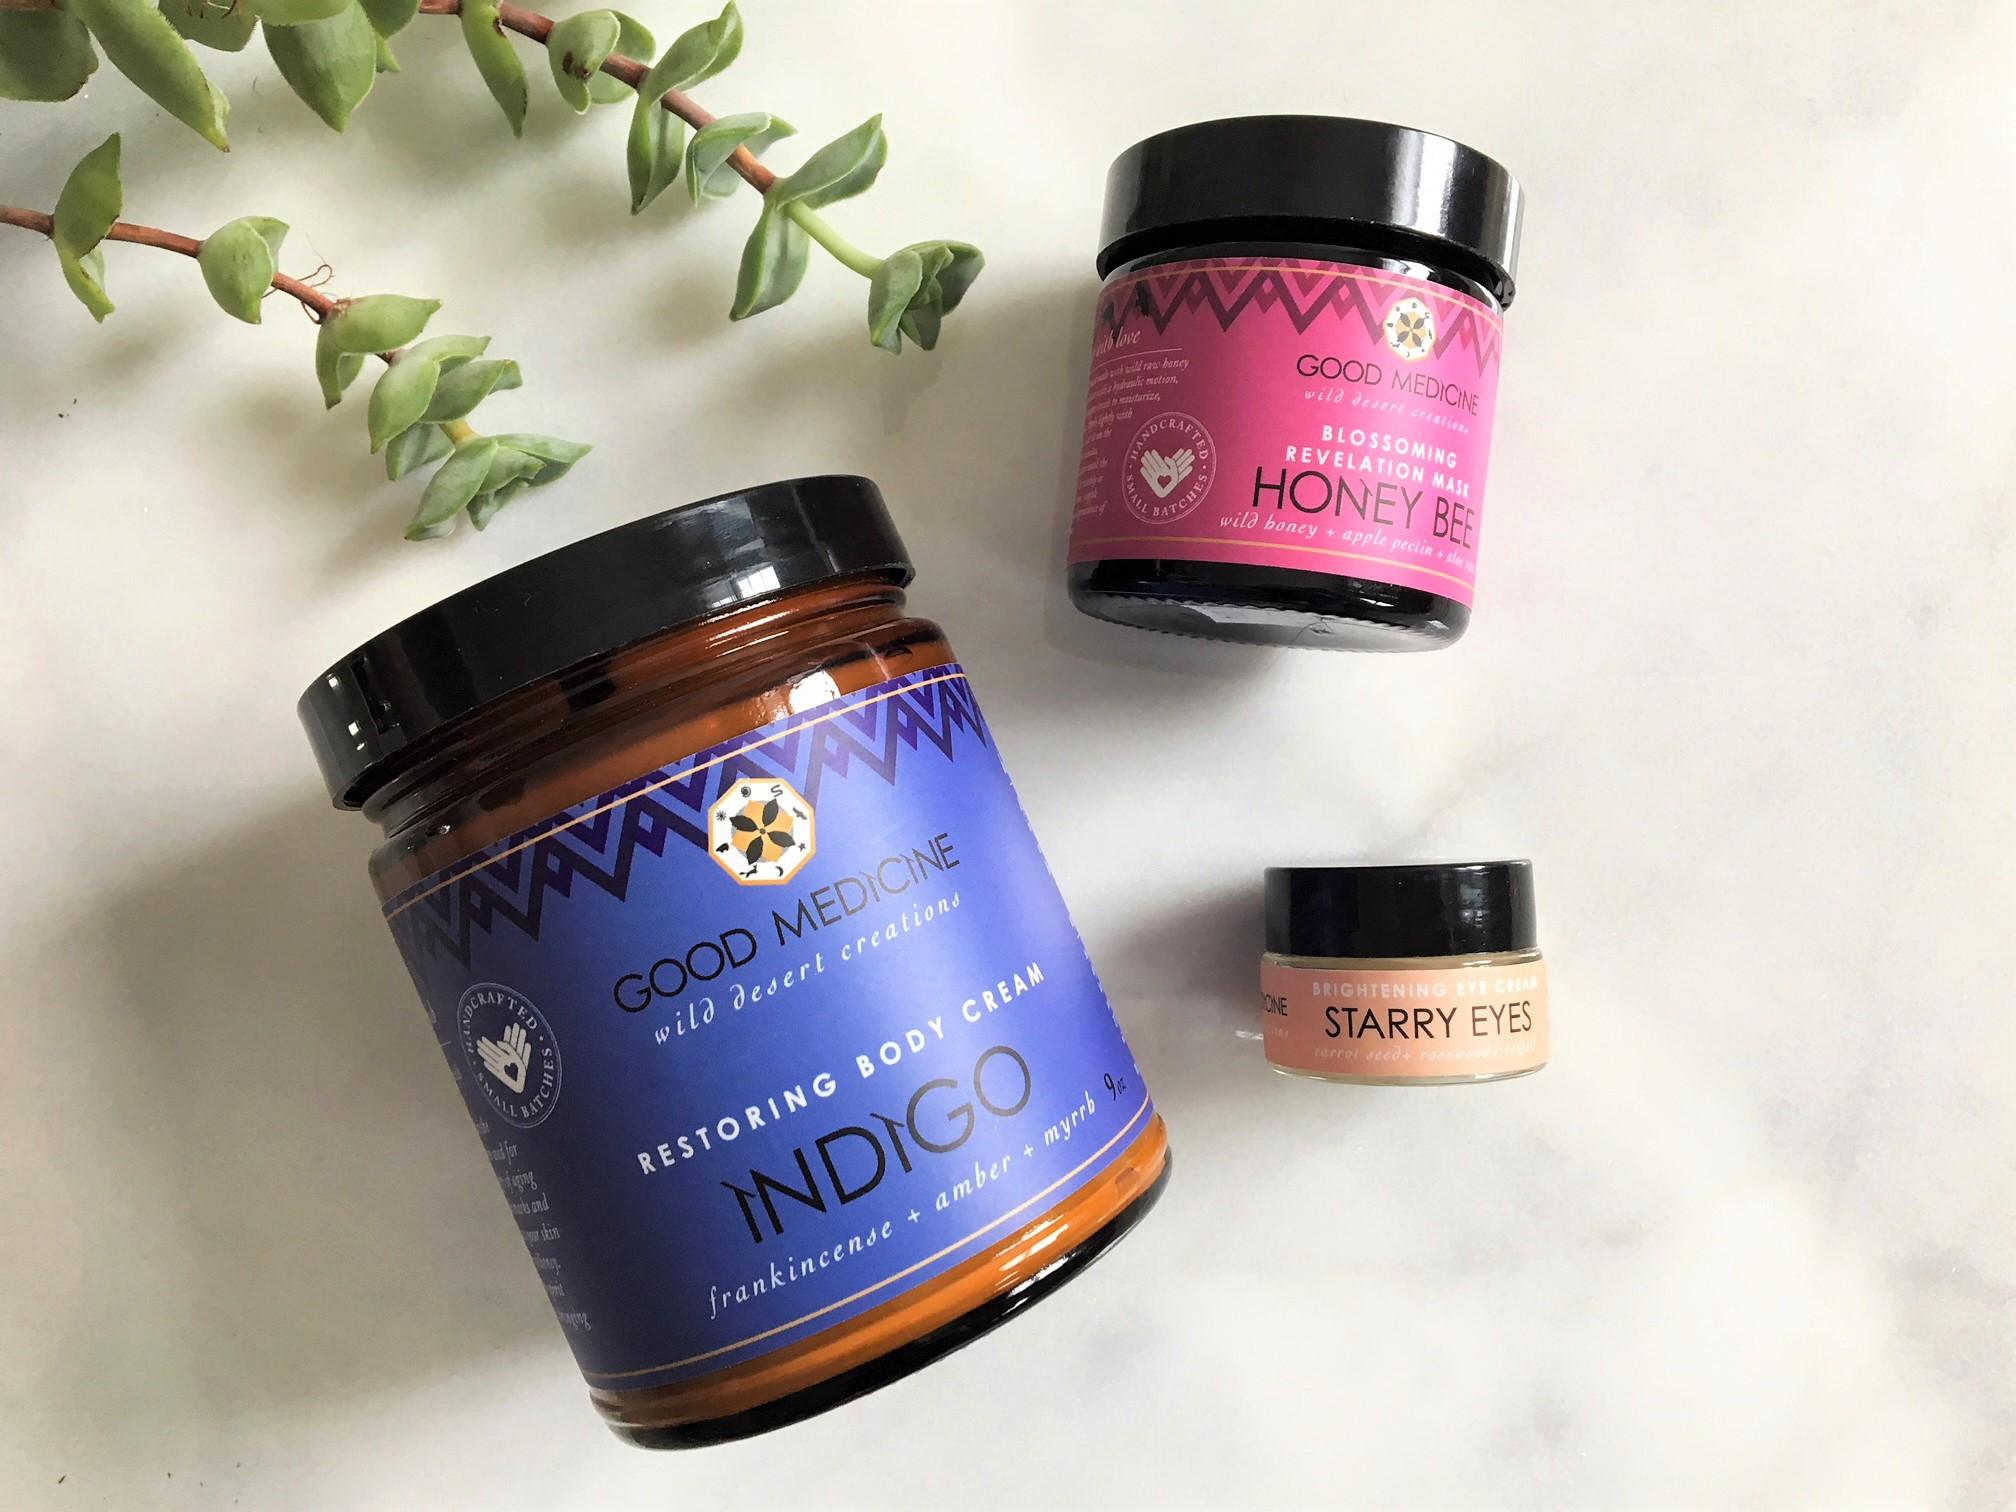 Good Medicine Beauty Lab review – Indigo and Honey Bee